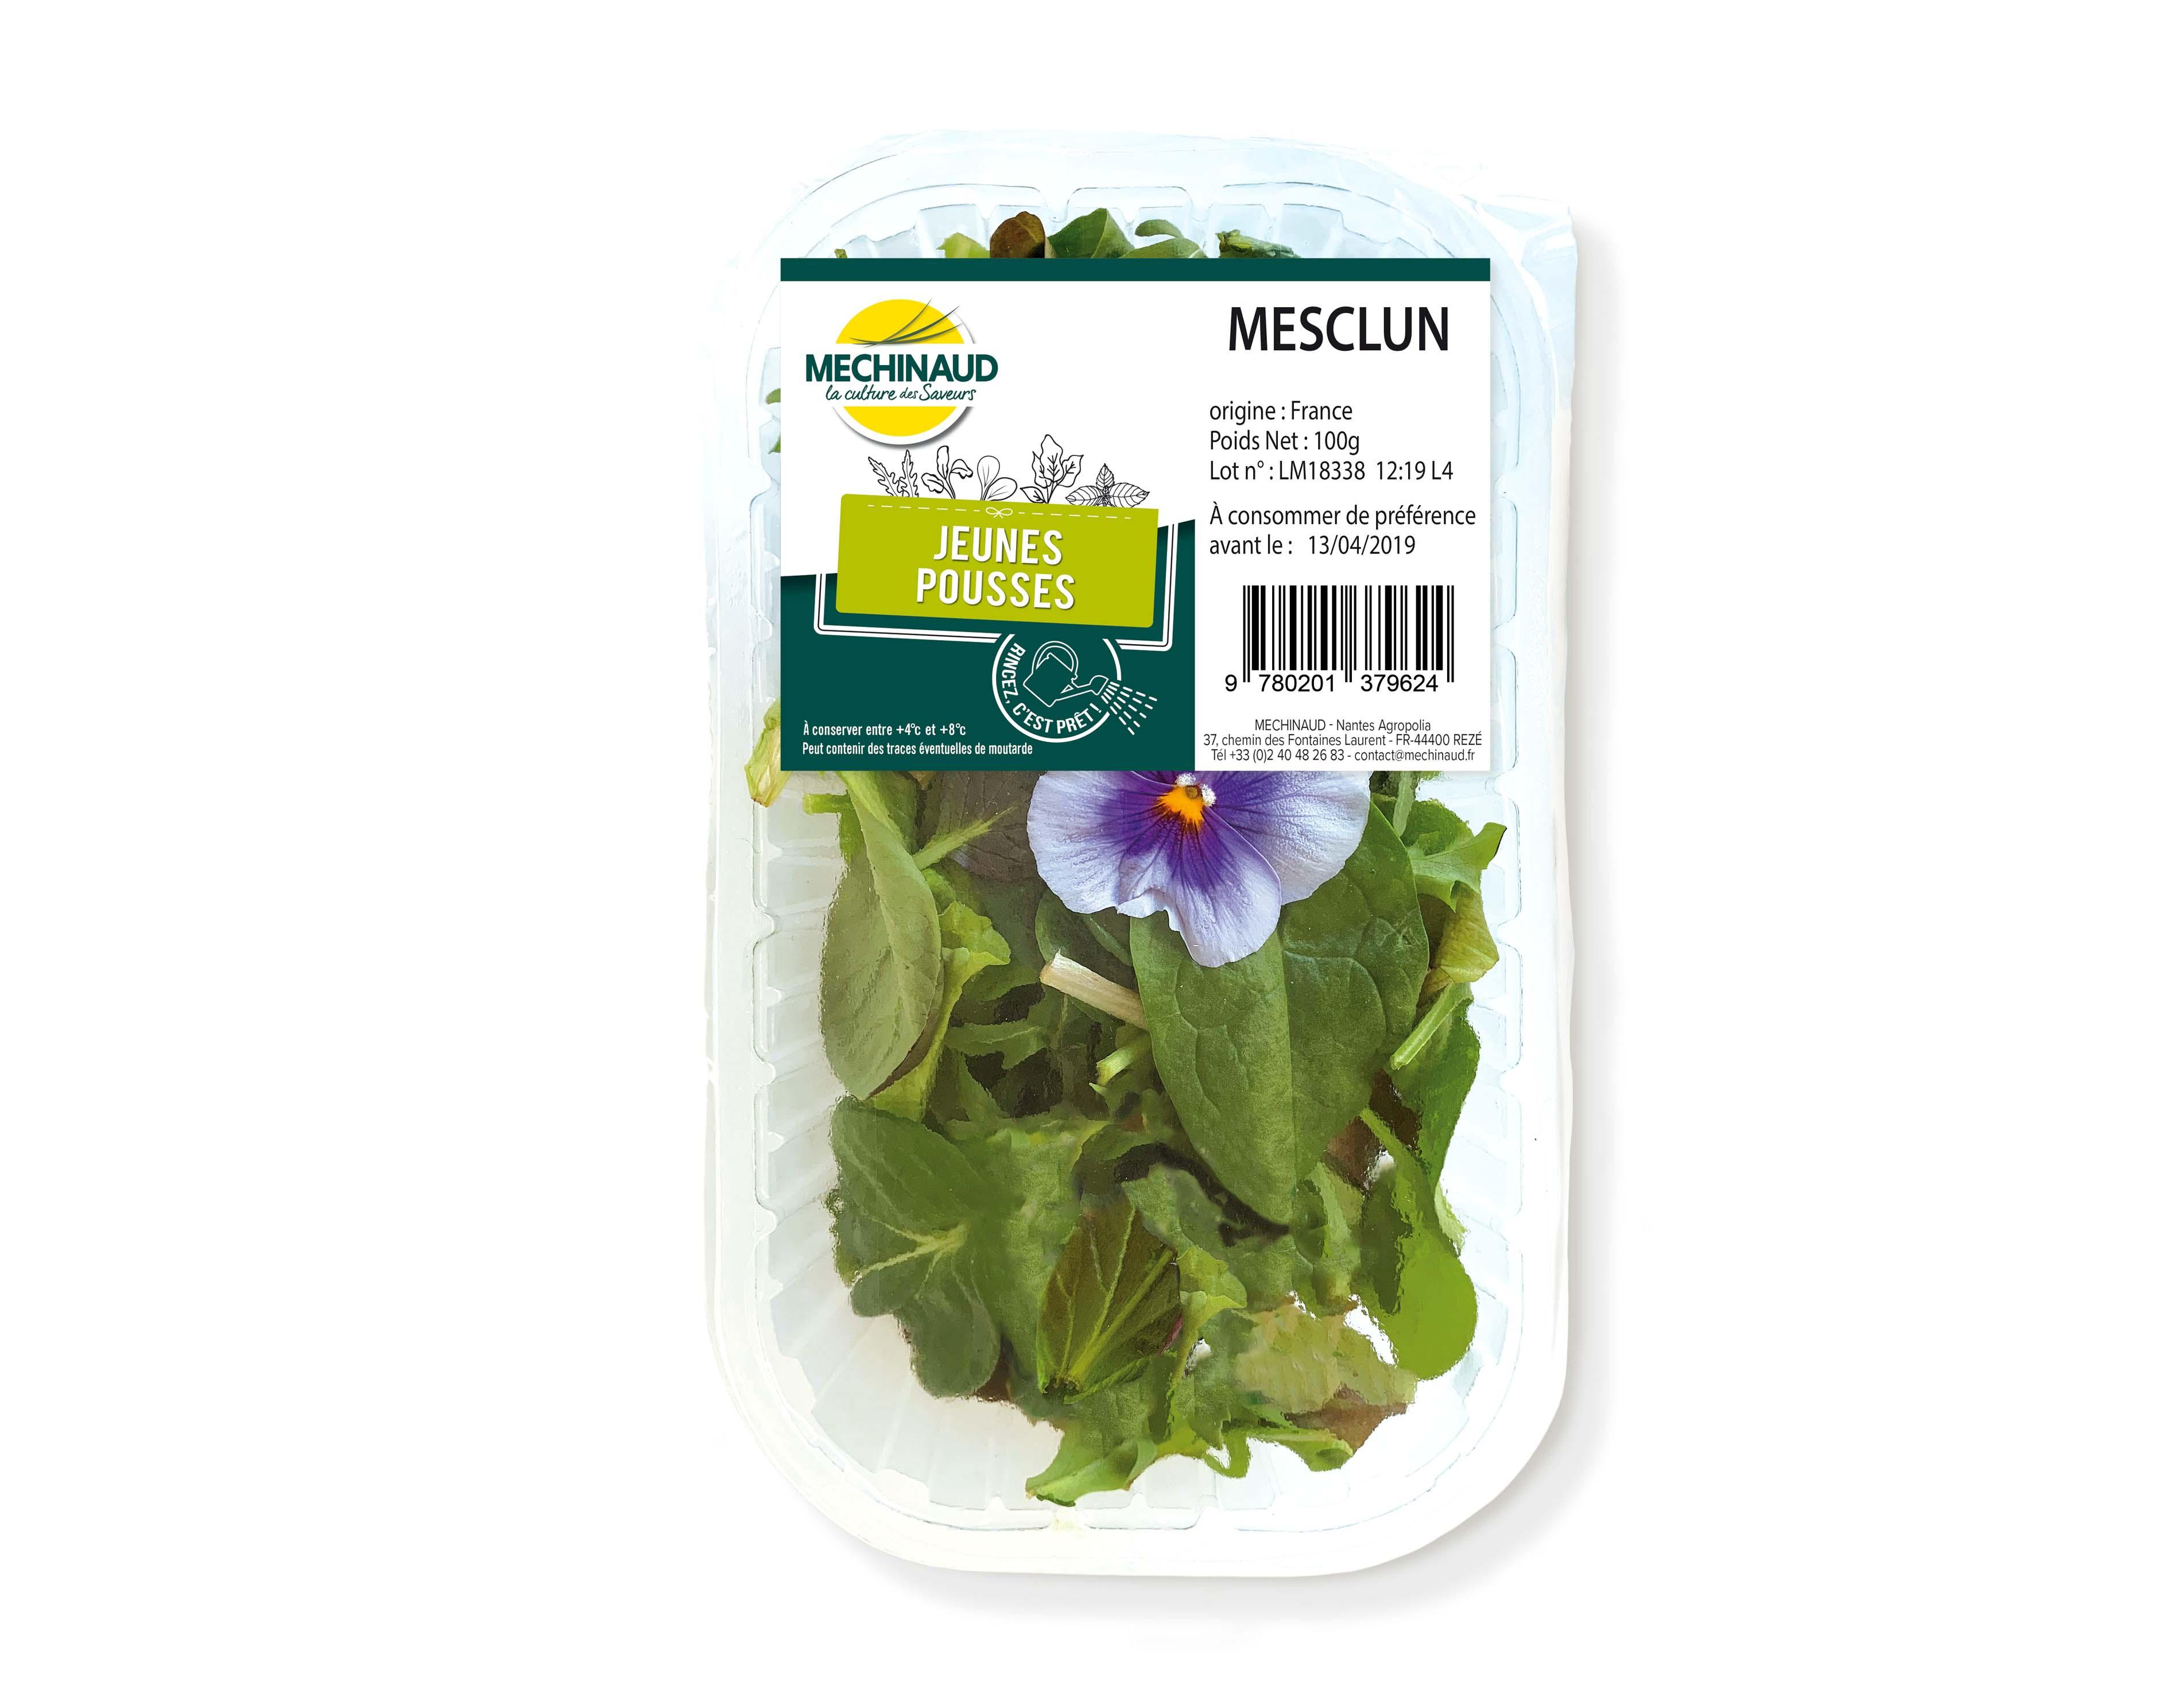 Mesclun Mechinaud